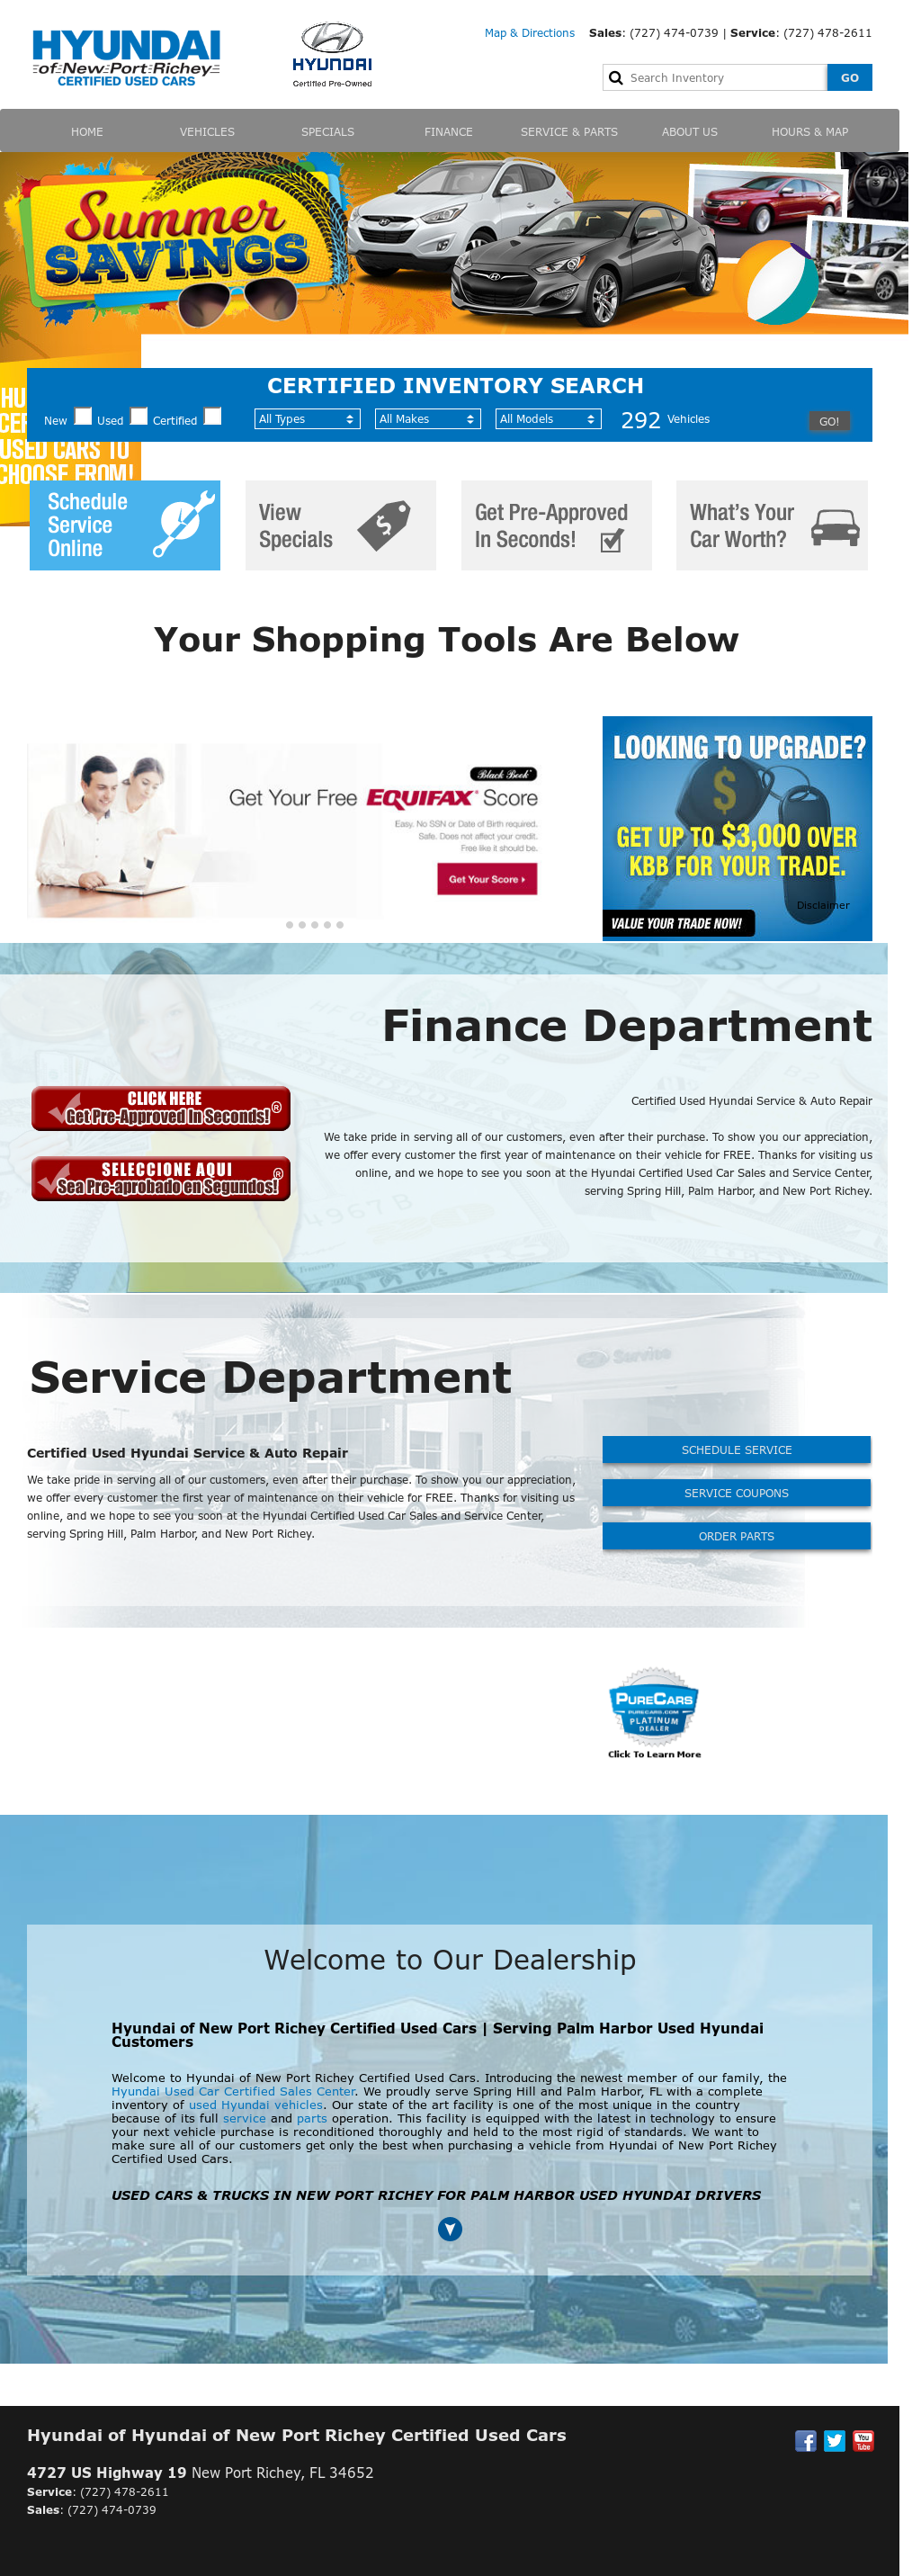 Hyundai Of New Port Richey Website History